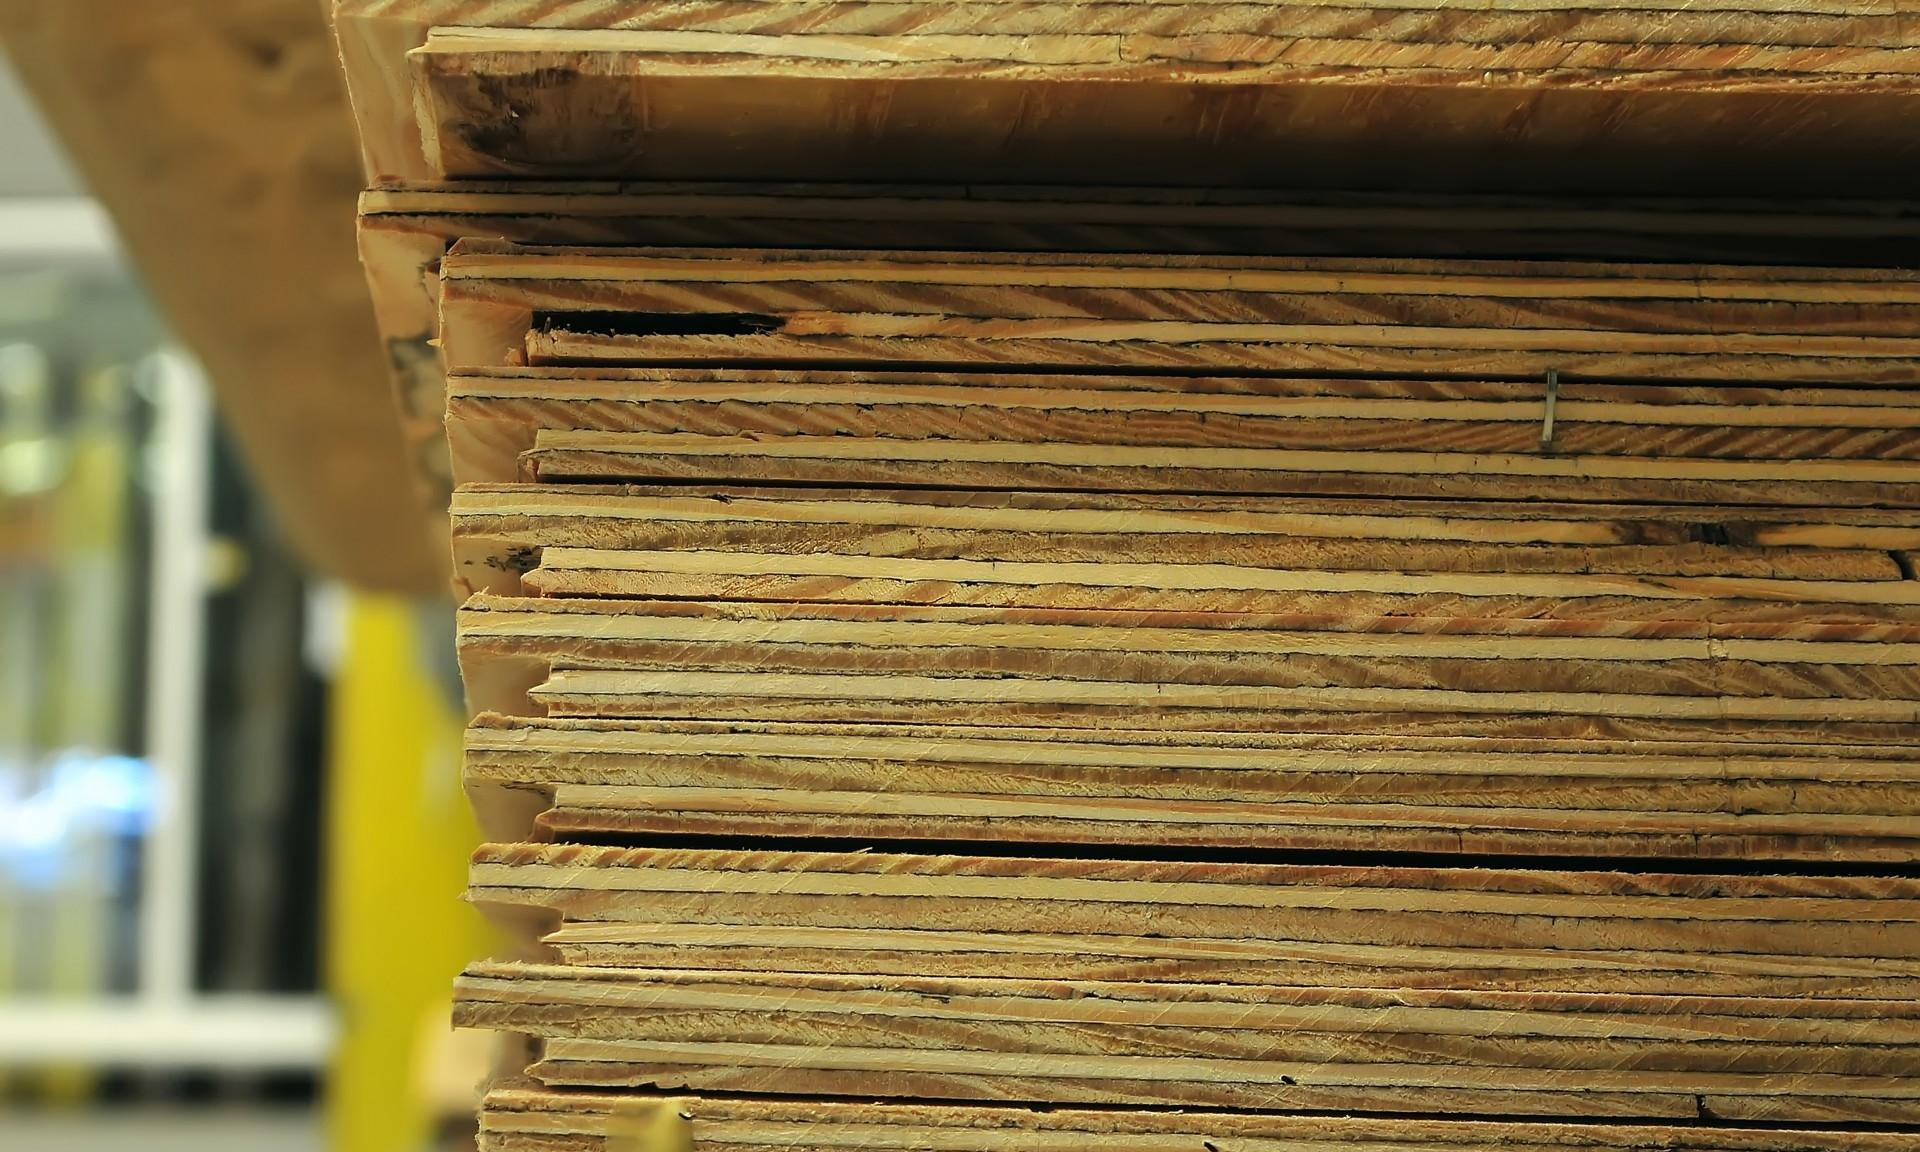 - Hardwood plywood